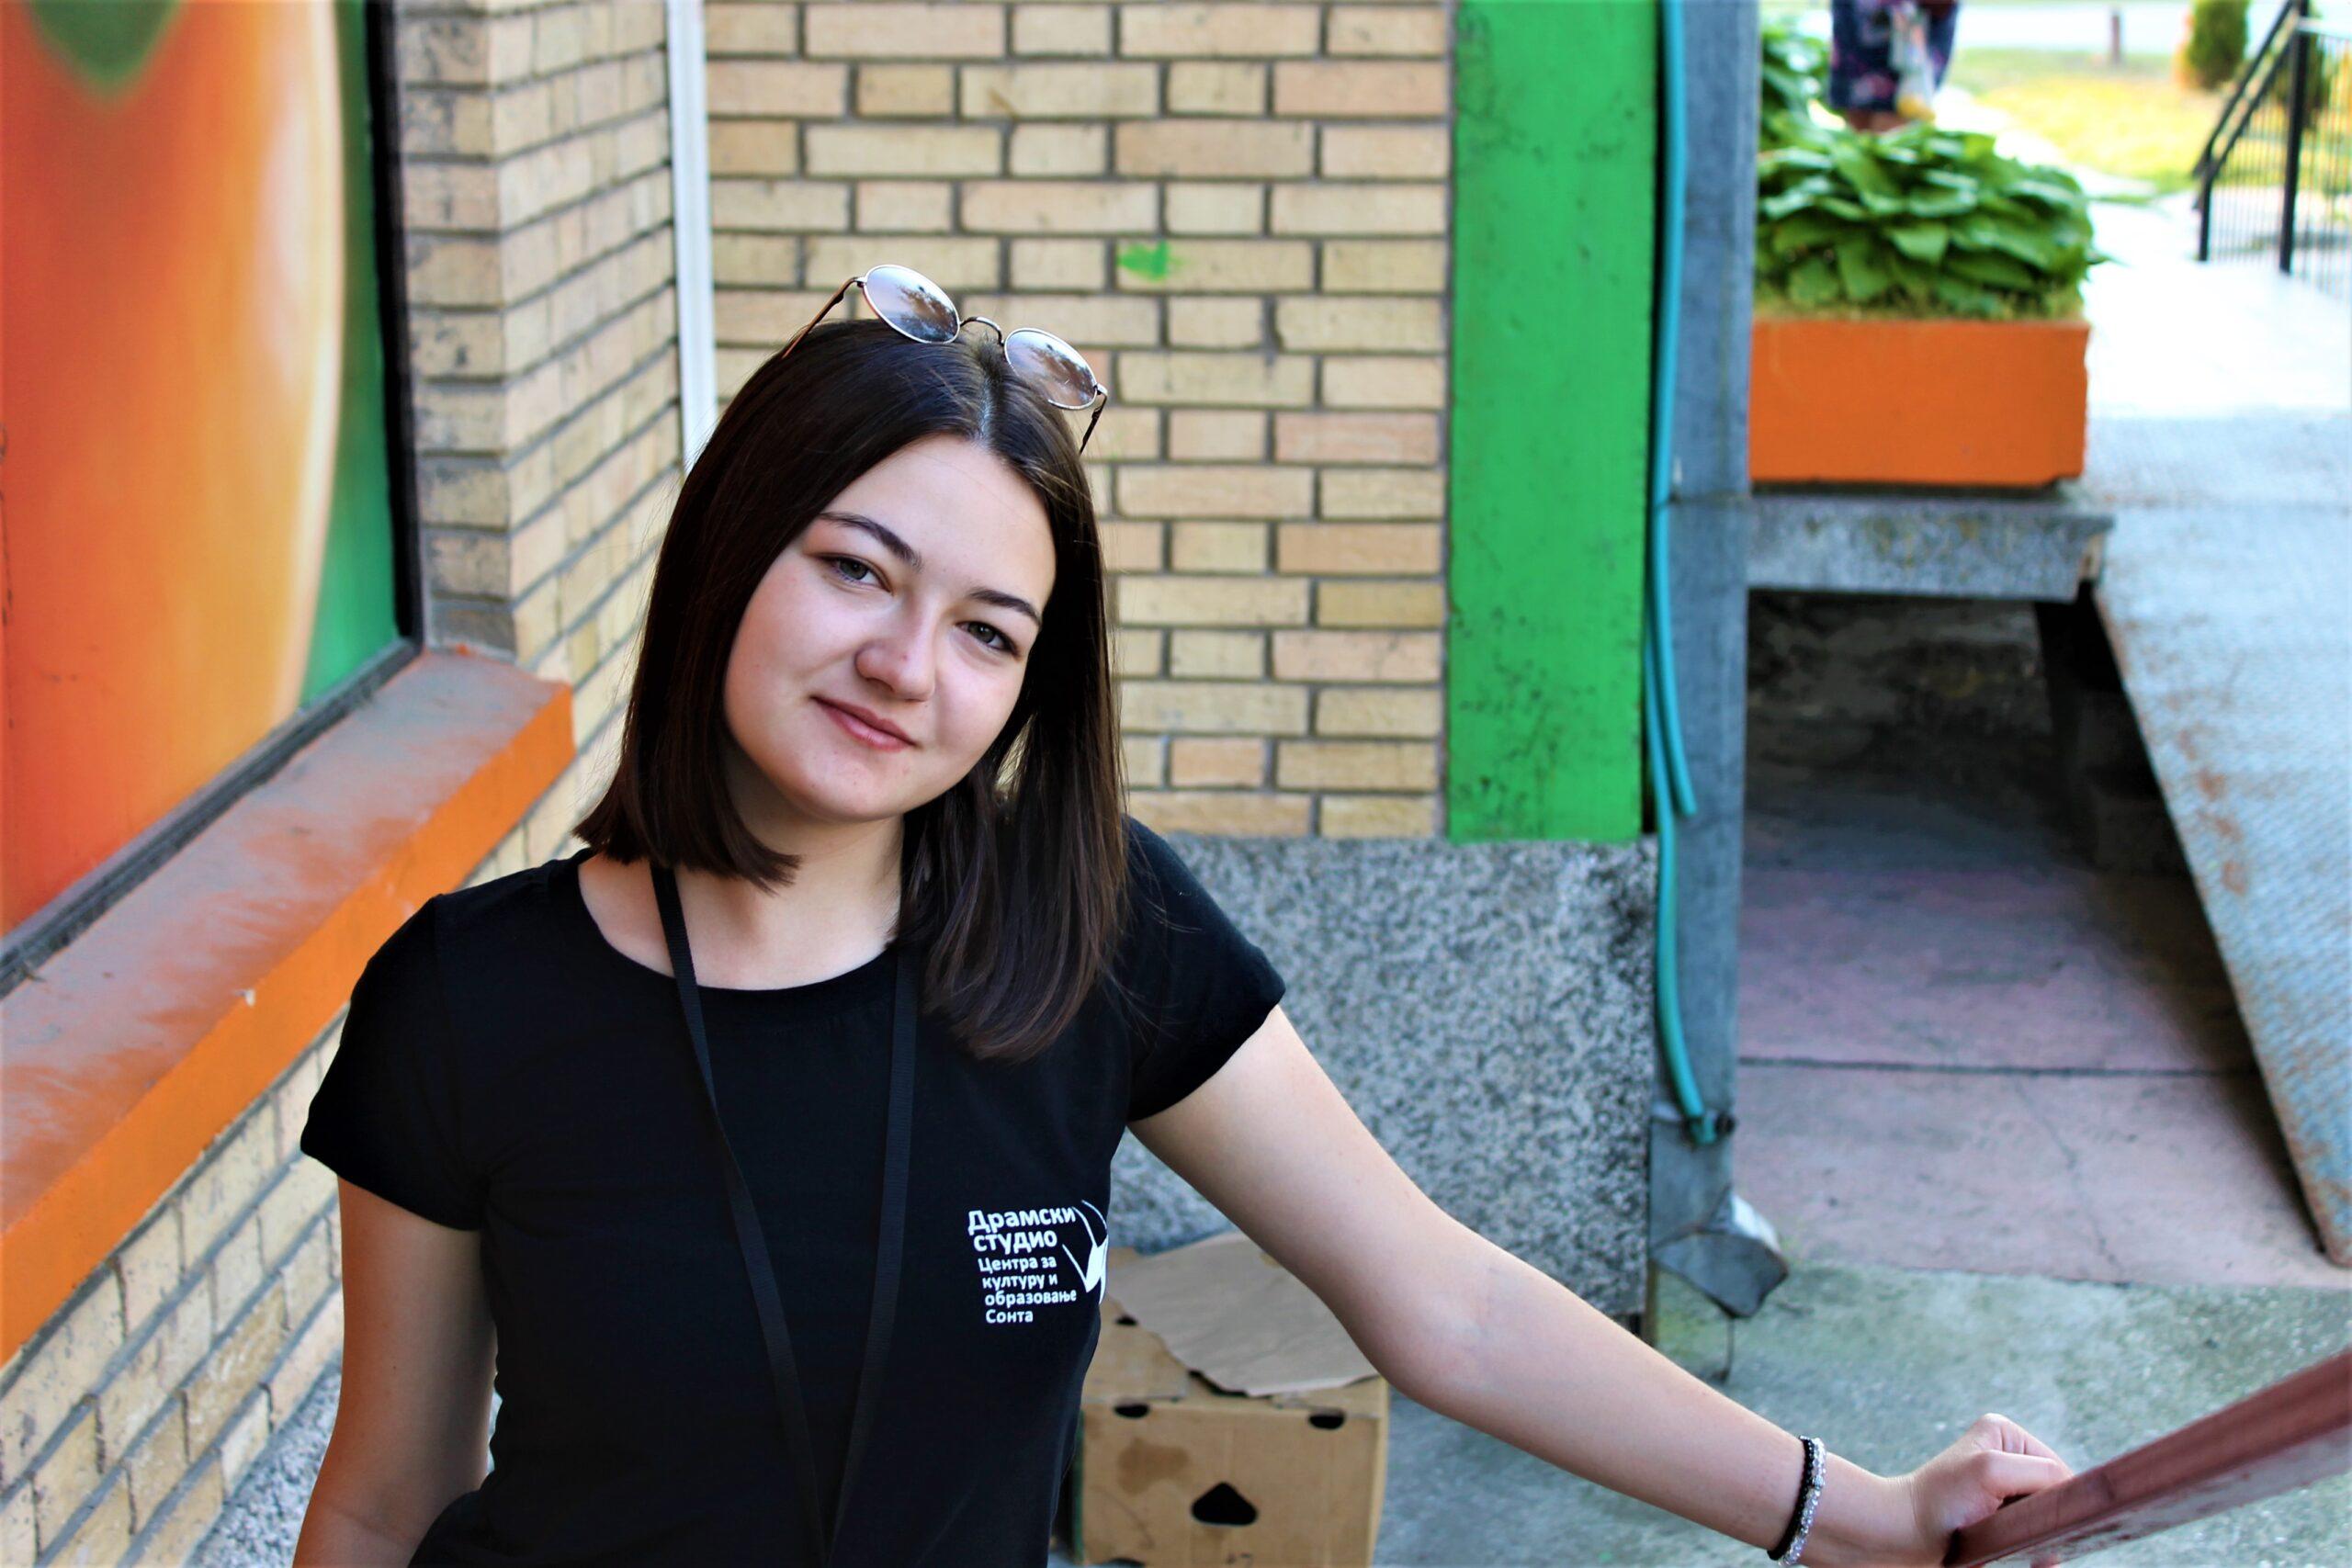 АНЂЕЛА ШИМУНОВ НОВА ПРЕДСЕДНИЦА ЦЕКОС-А